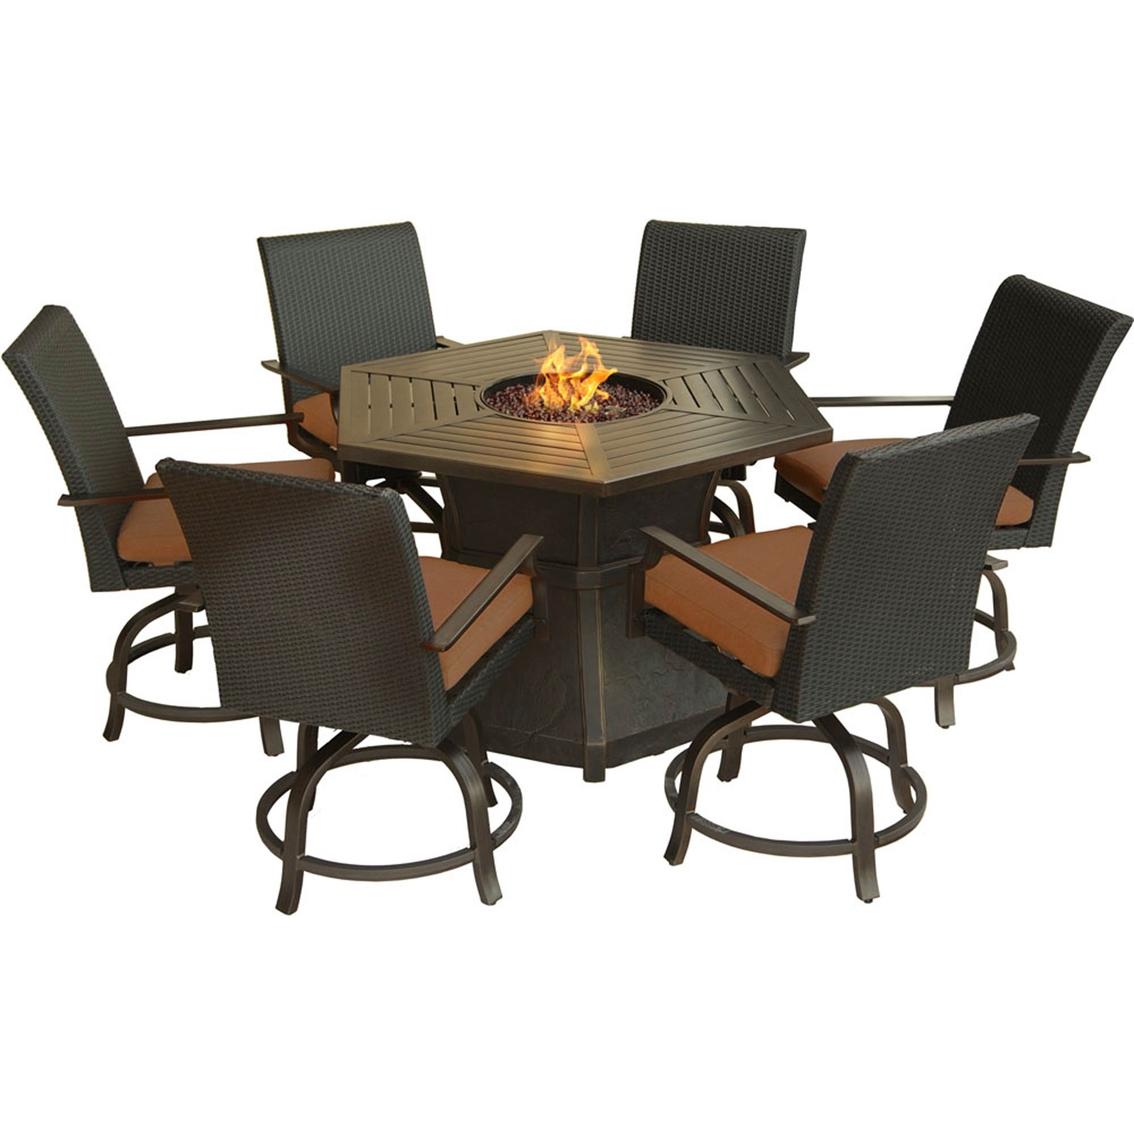 Hanover Outdoor Furniture Aspen Creek 7 Pc. Fire Pit ...